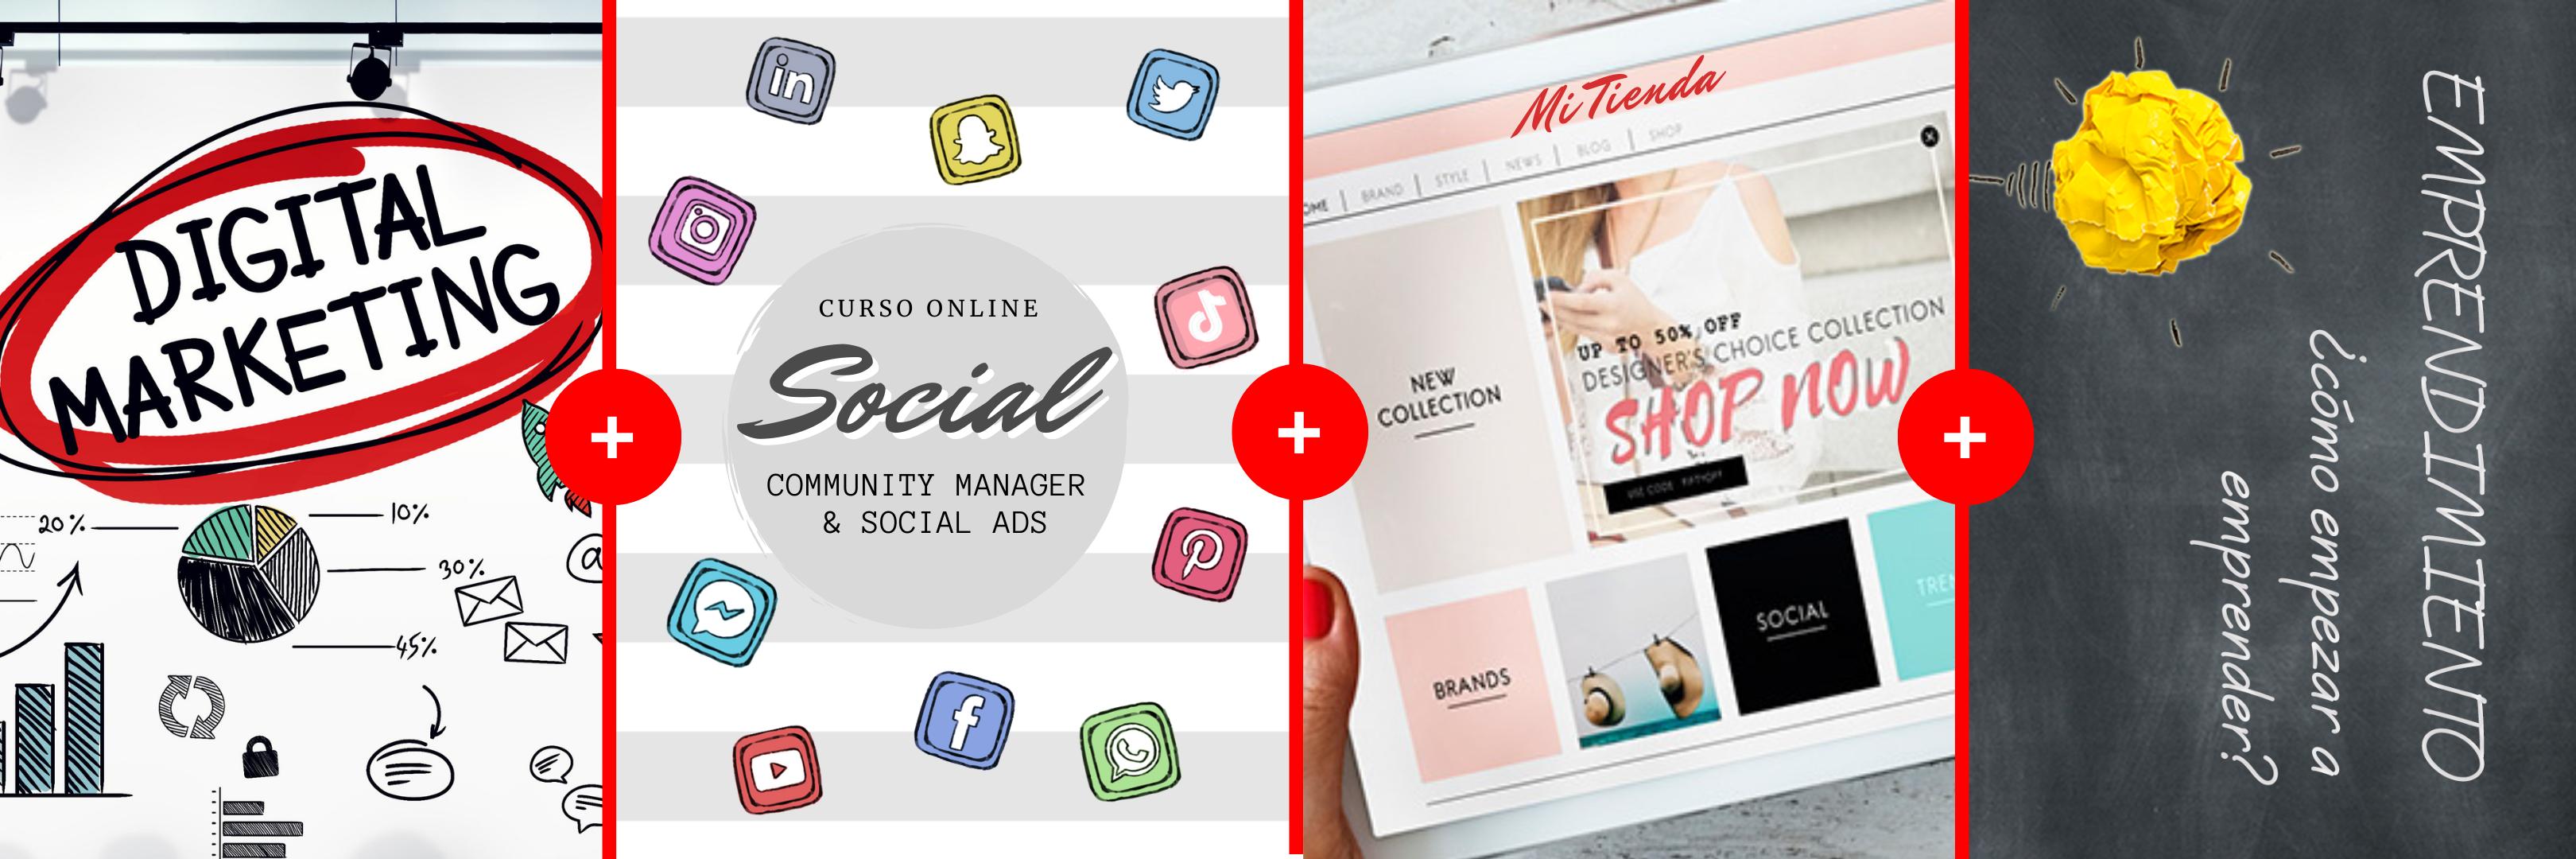 PACK x 3: Marketing Digital + Redes Sociales + eCommerce + Emprendimiento